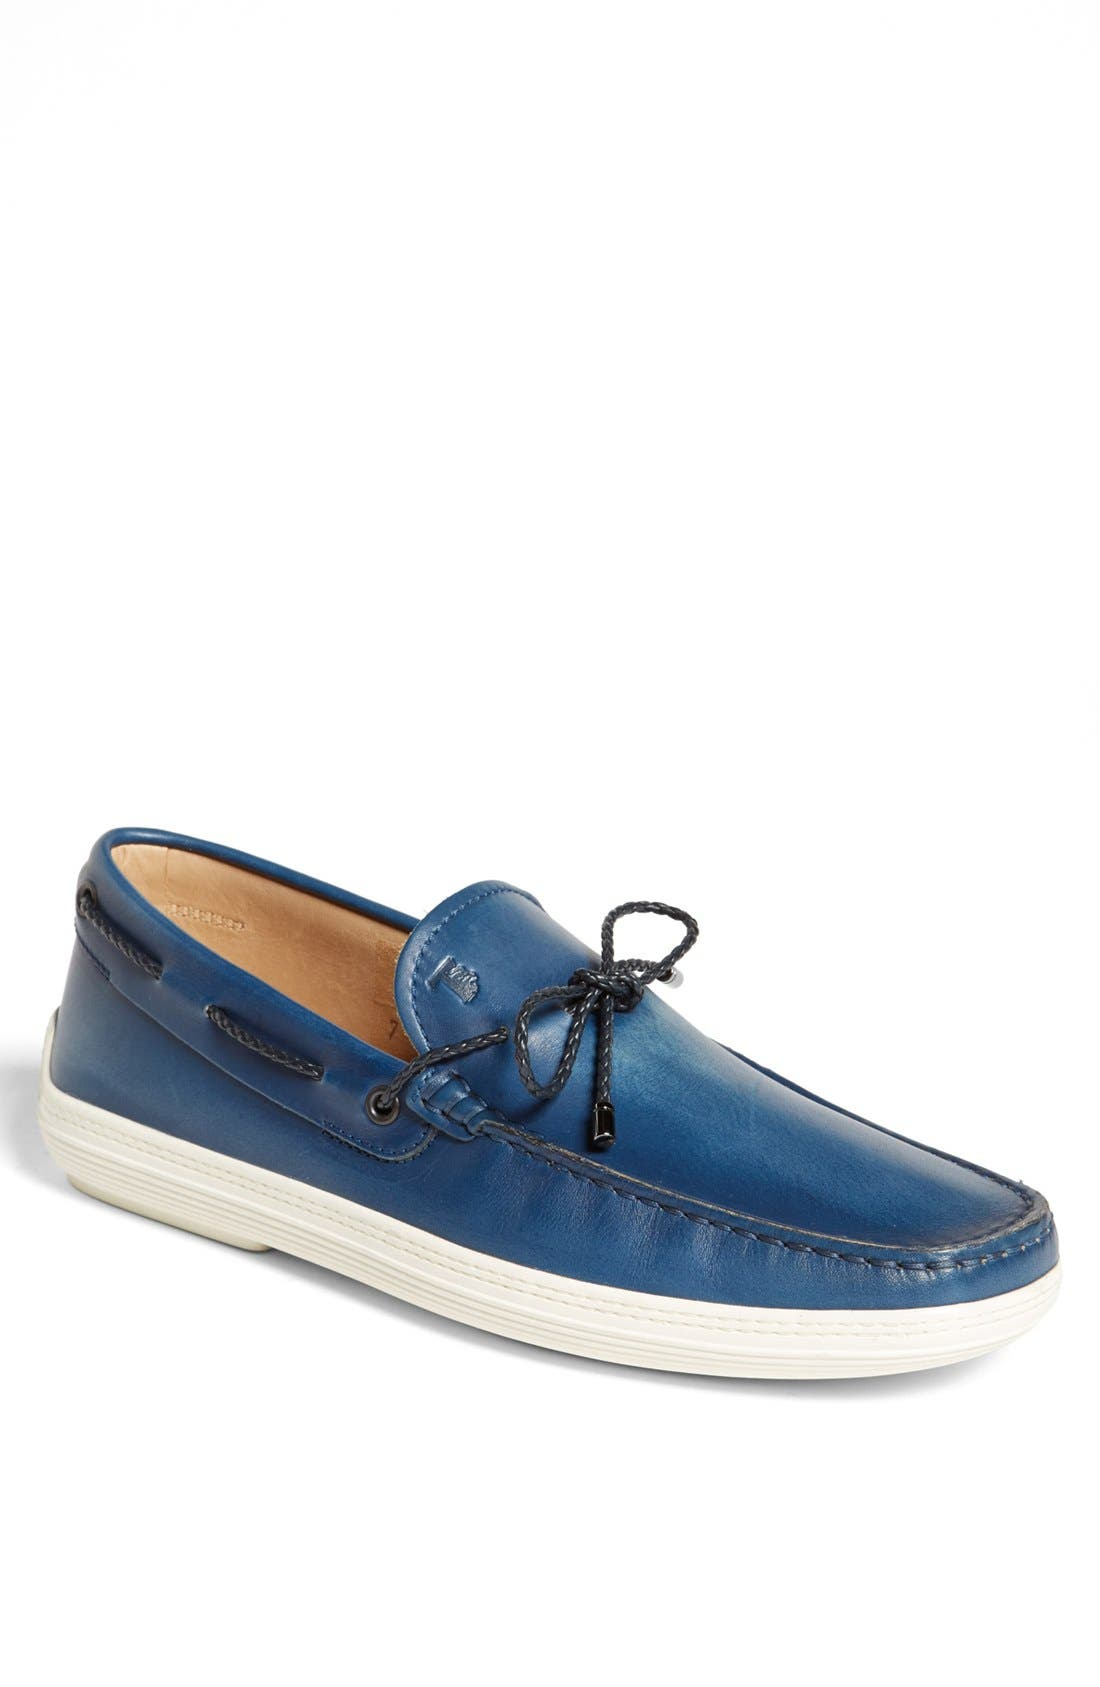 Main Image - Tod's 'Marlin' Boat Shoe